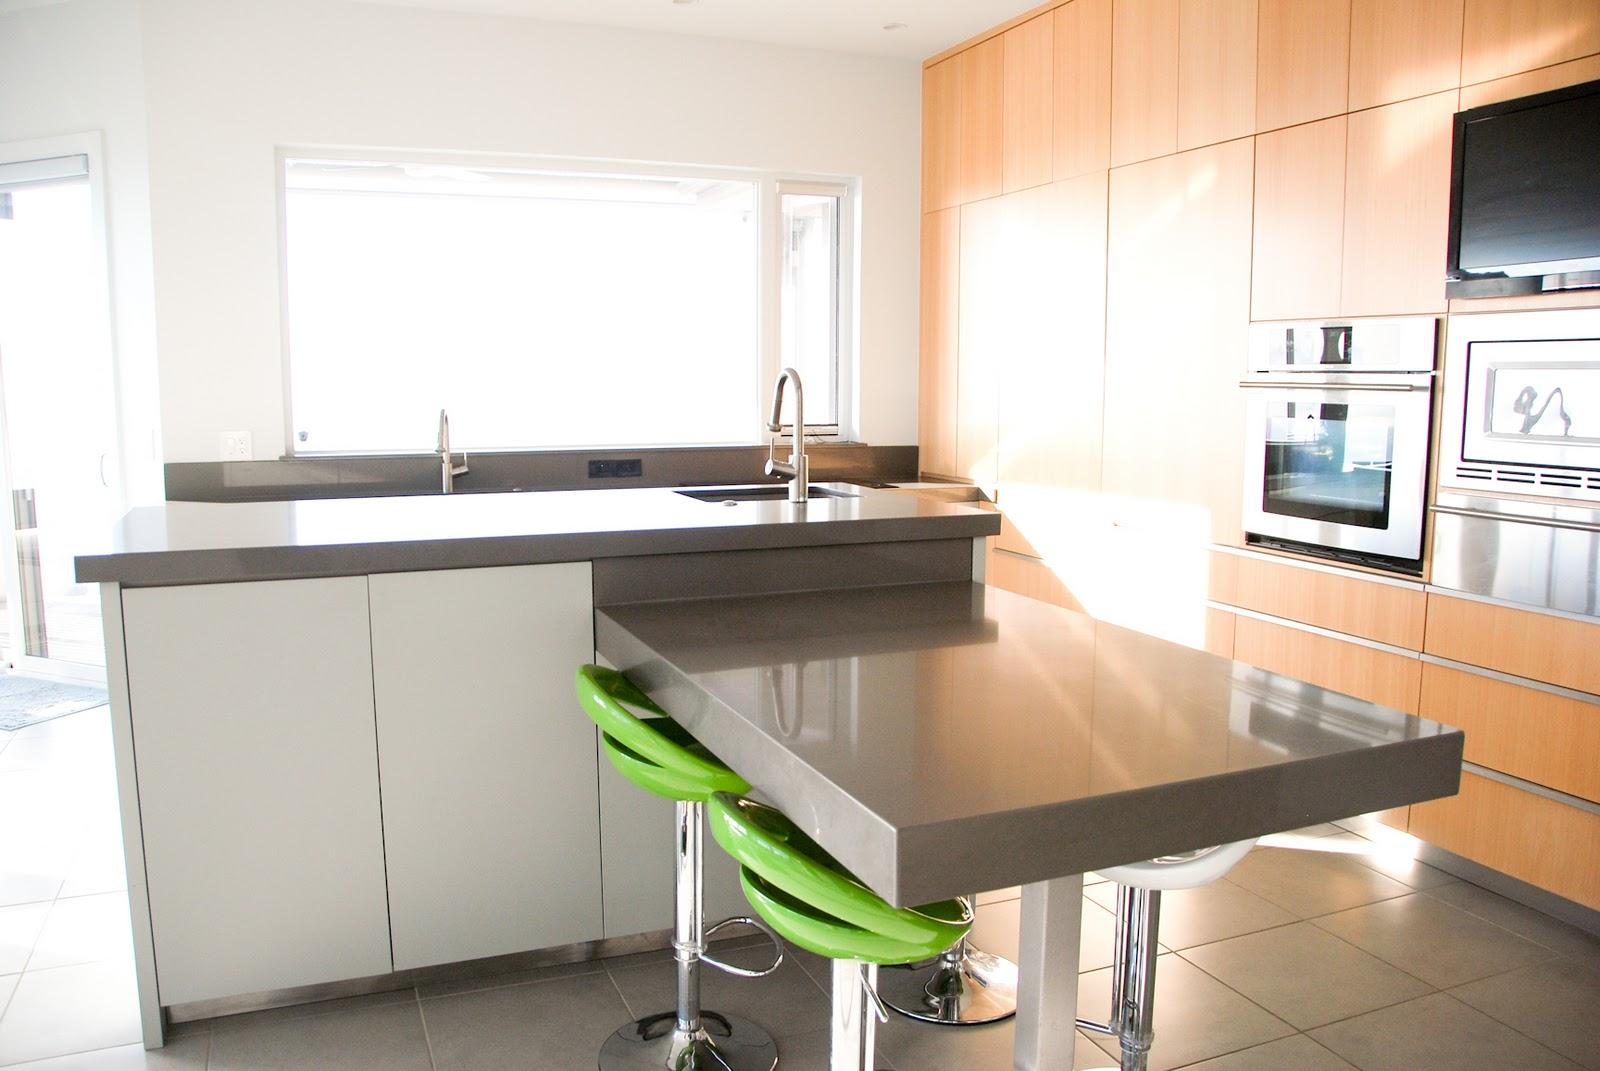 Kitchen counters kitchens and chic on pinterest caesarstone kitchen